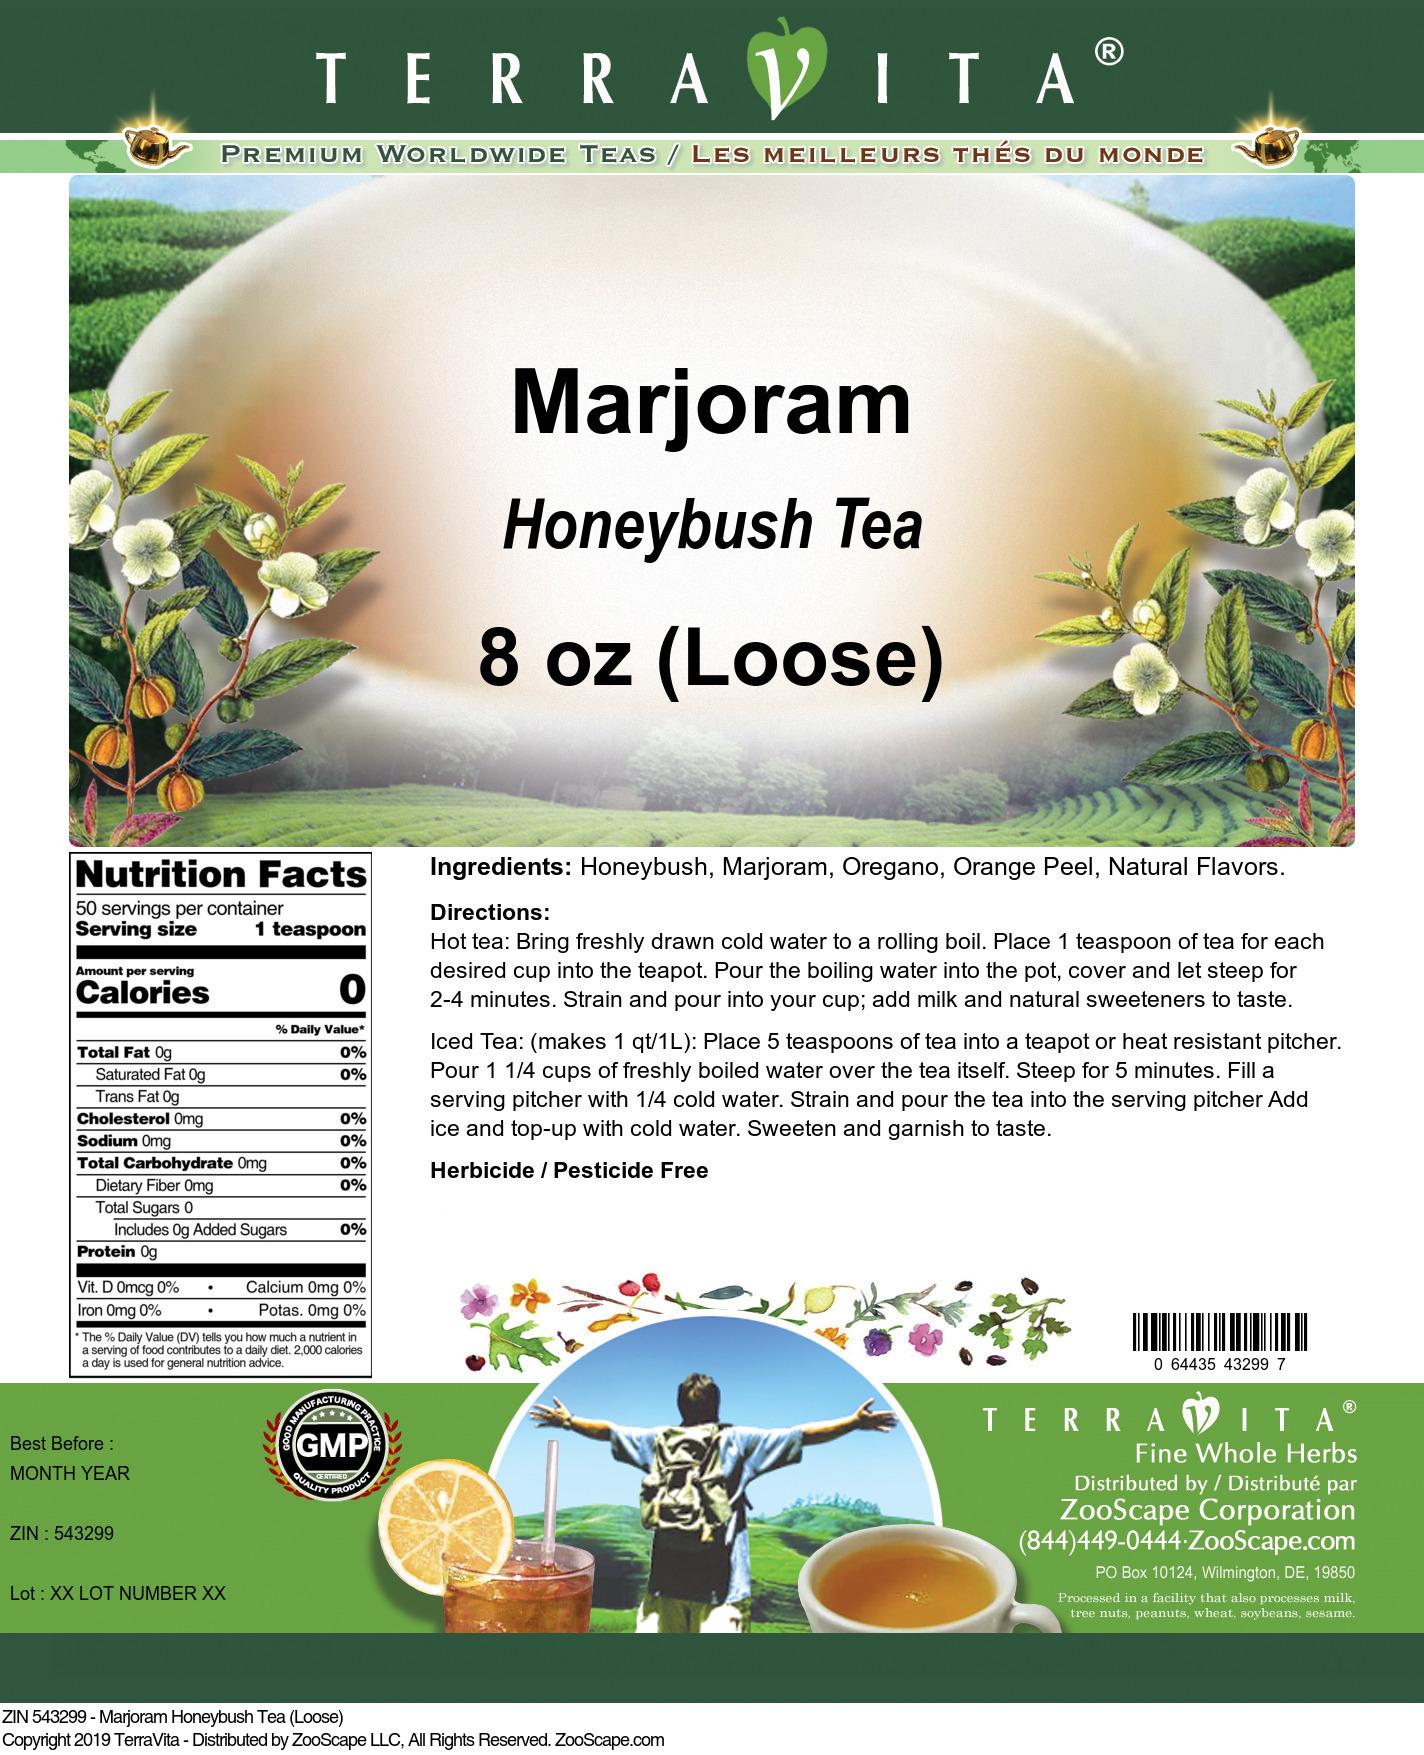 Marjoram Honeybush Tea